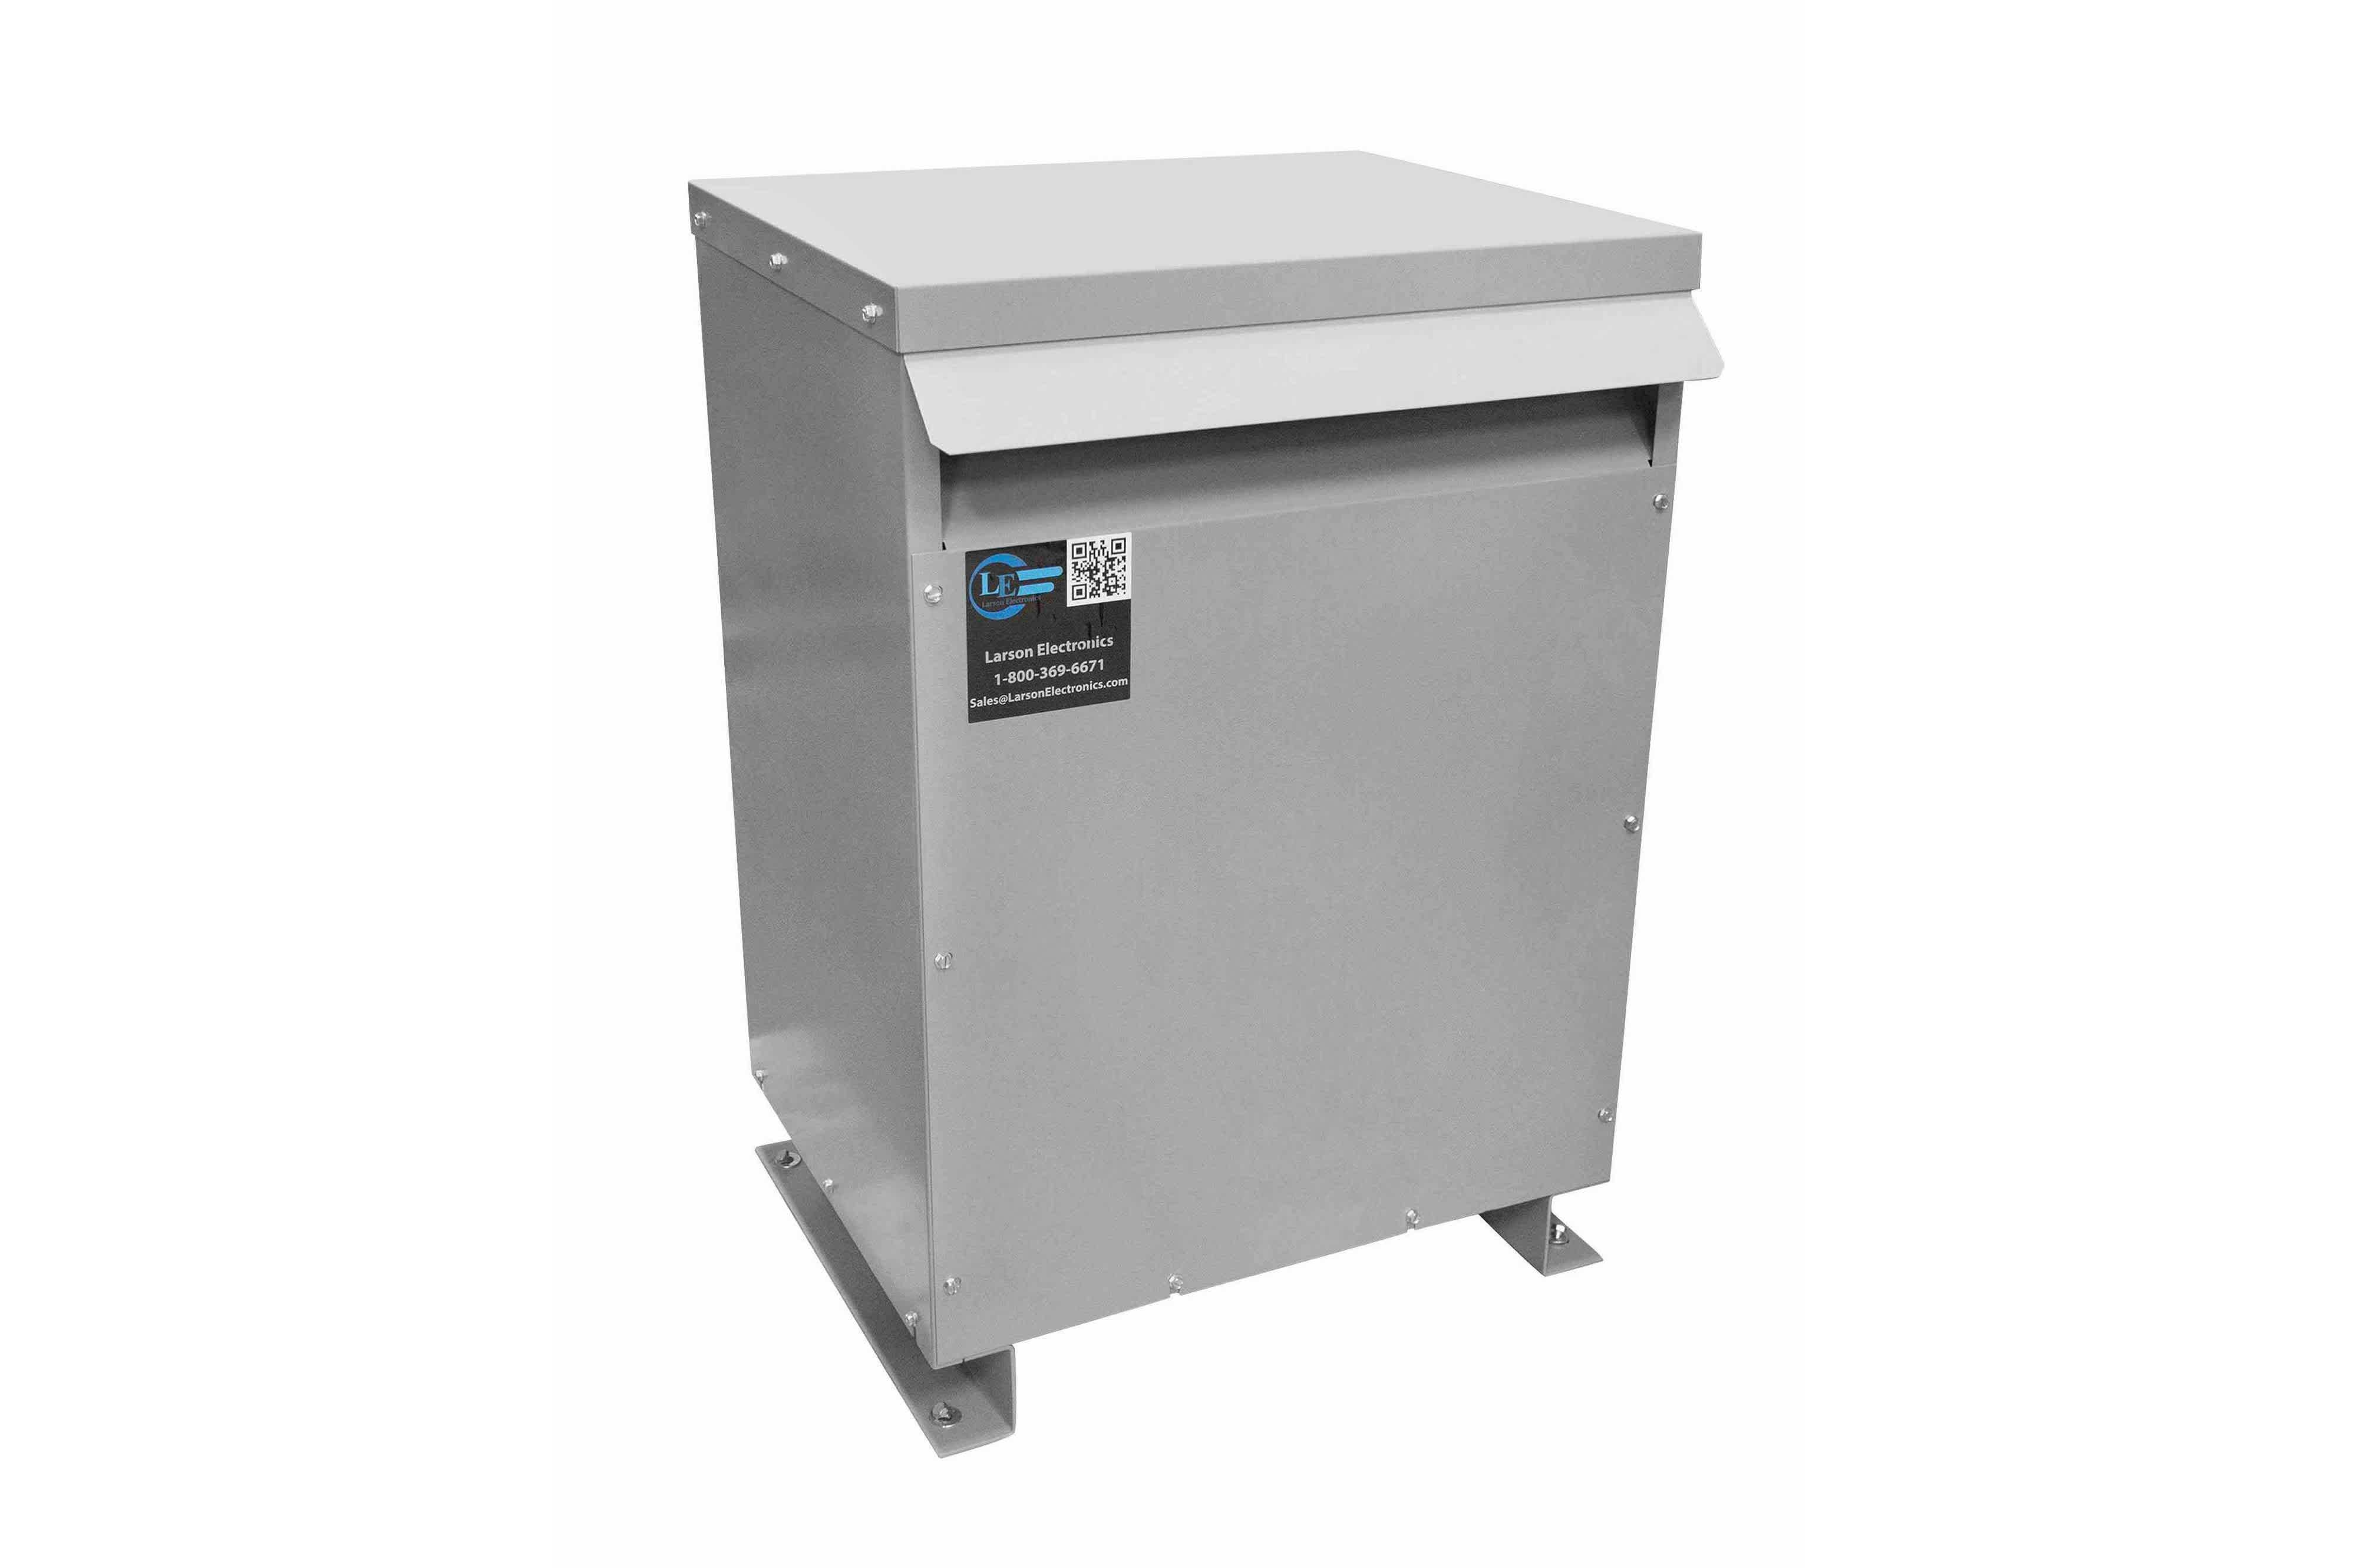 12 kVA 3PH Isolation Transformer, 460V Wye Primary, 240V Delta Secondary, N3R, Ventilated, 60 Hz